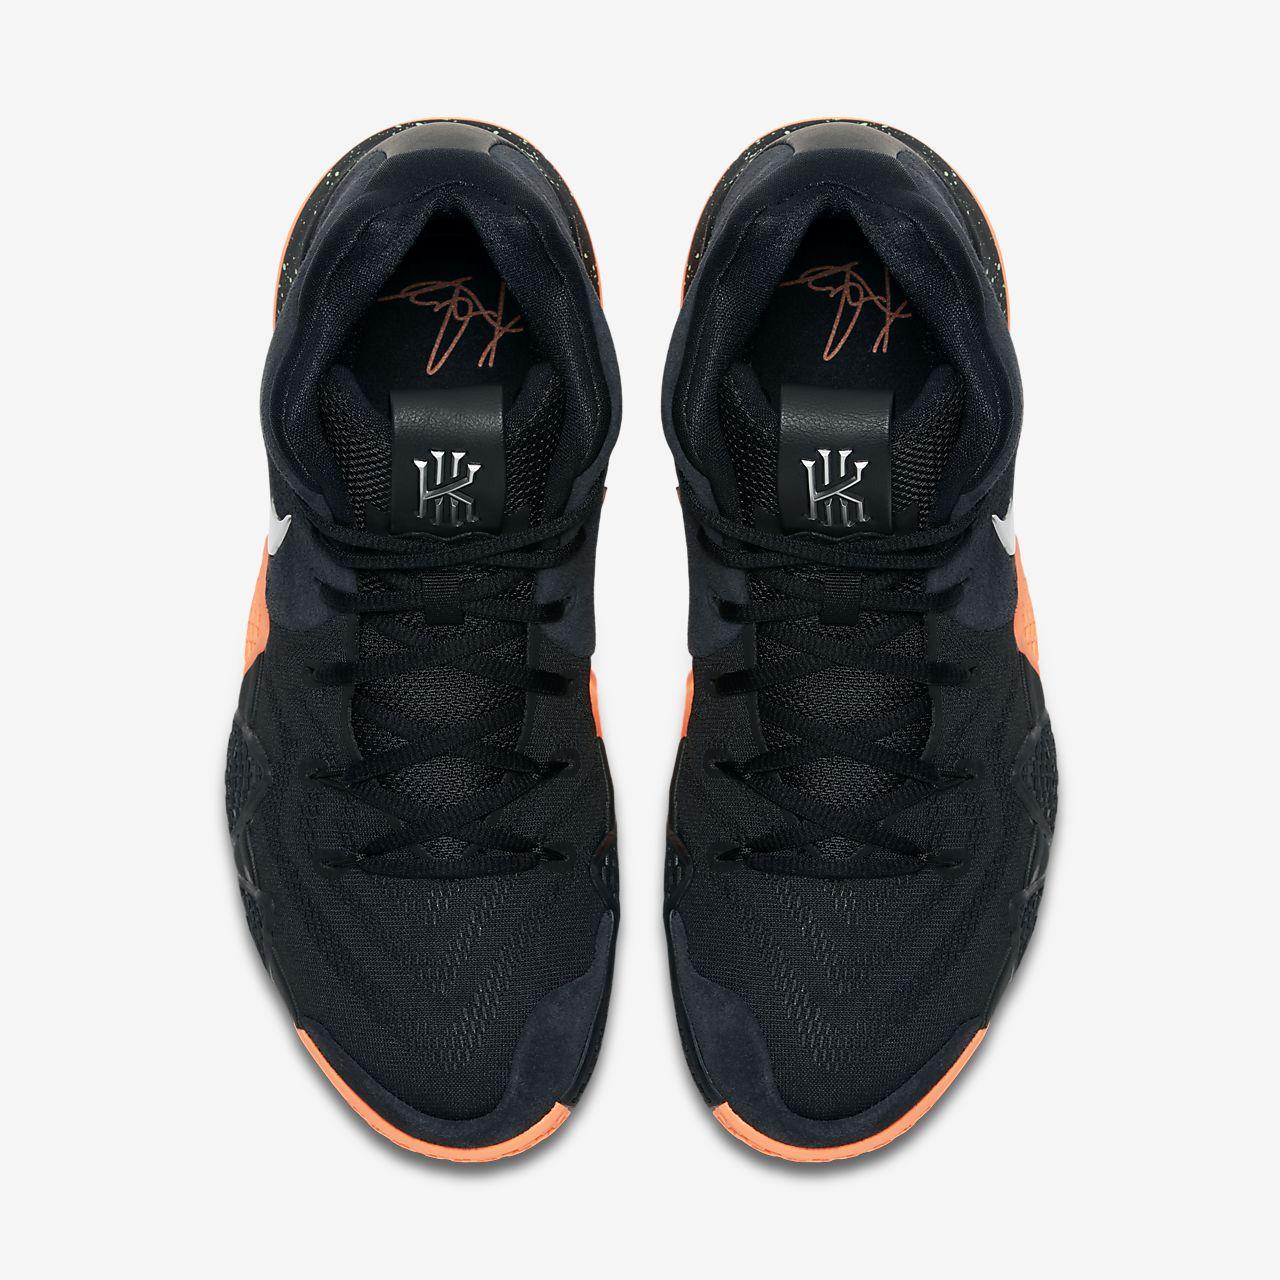 04-nike-kyrie-4-black-silver-orange-943806-010